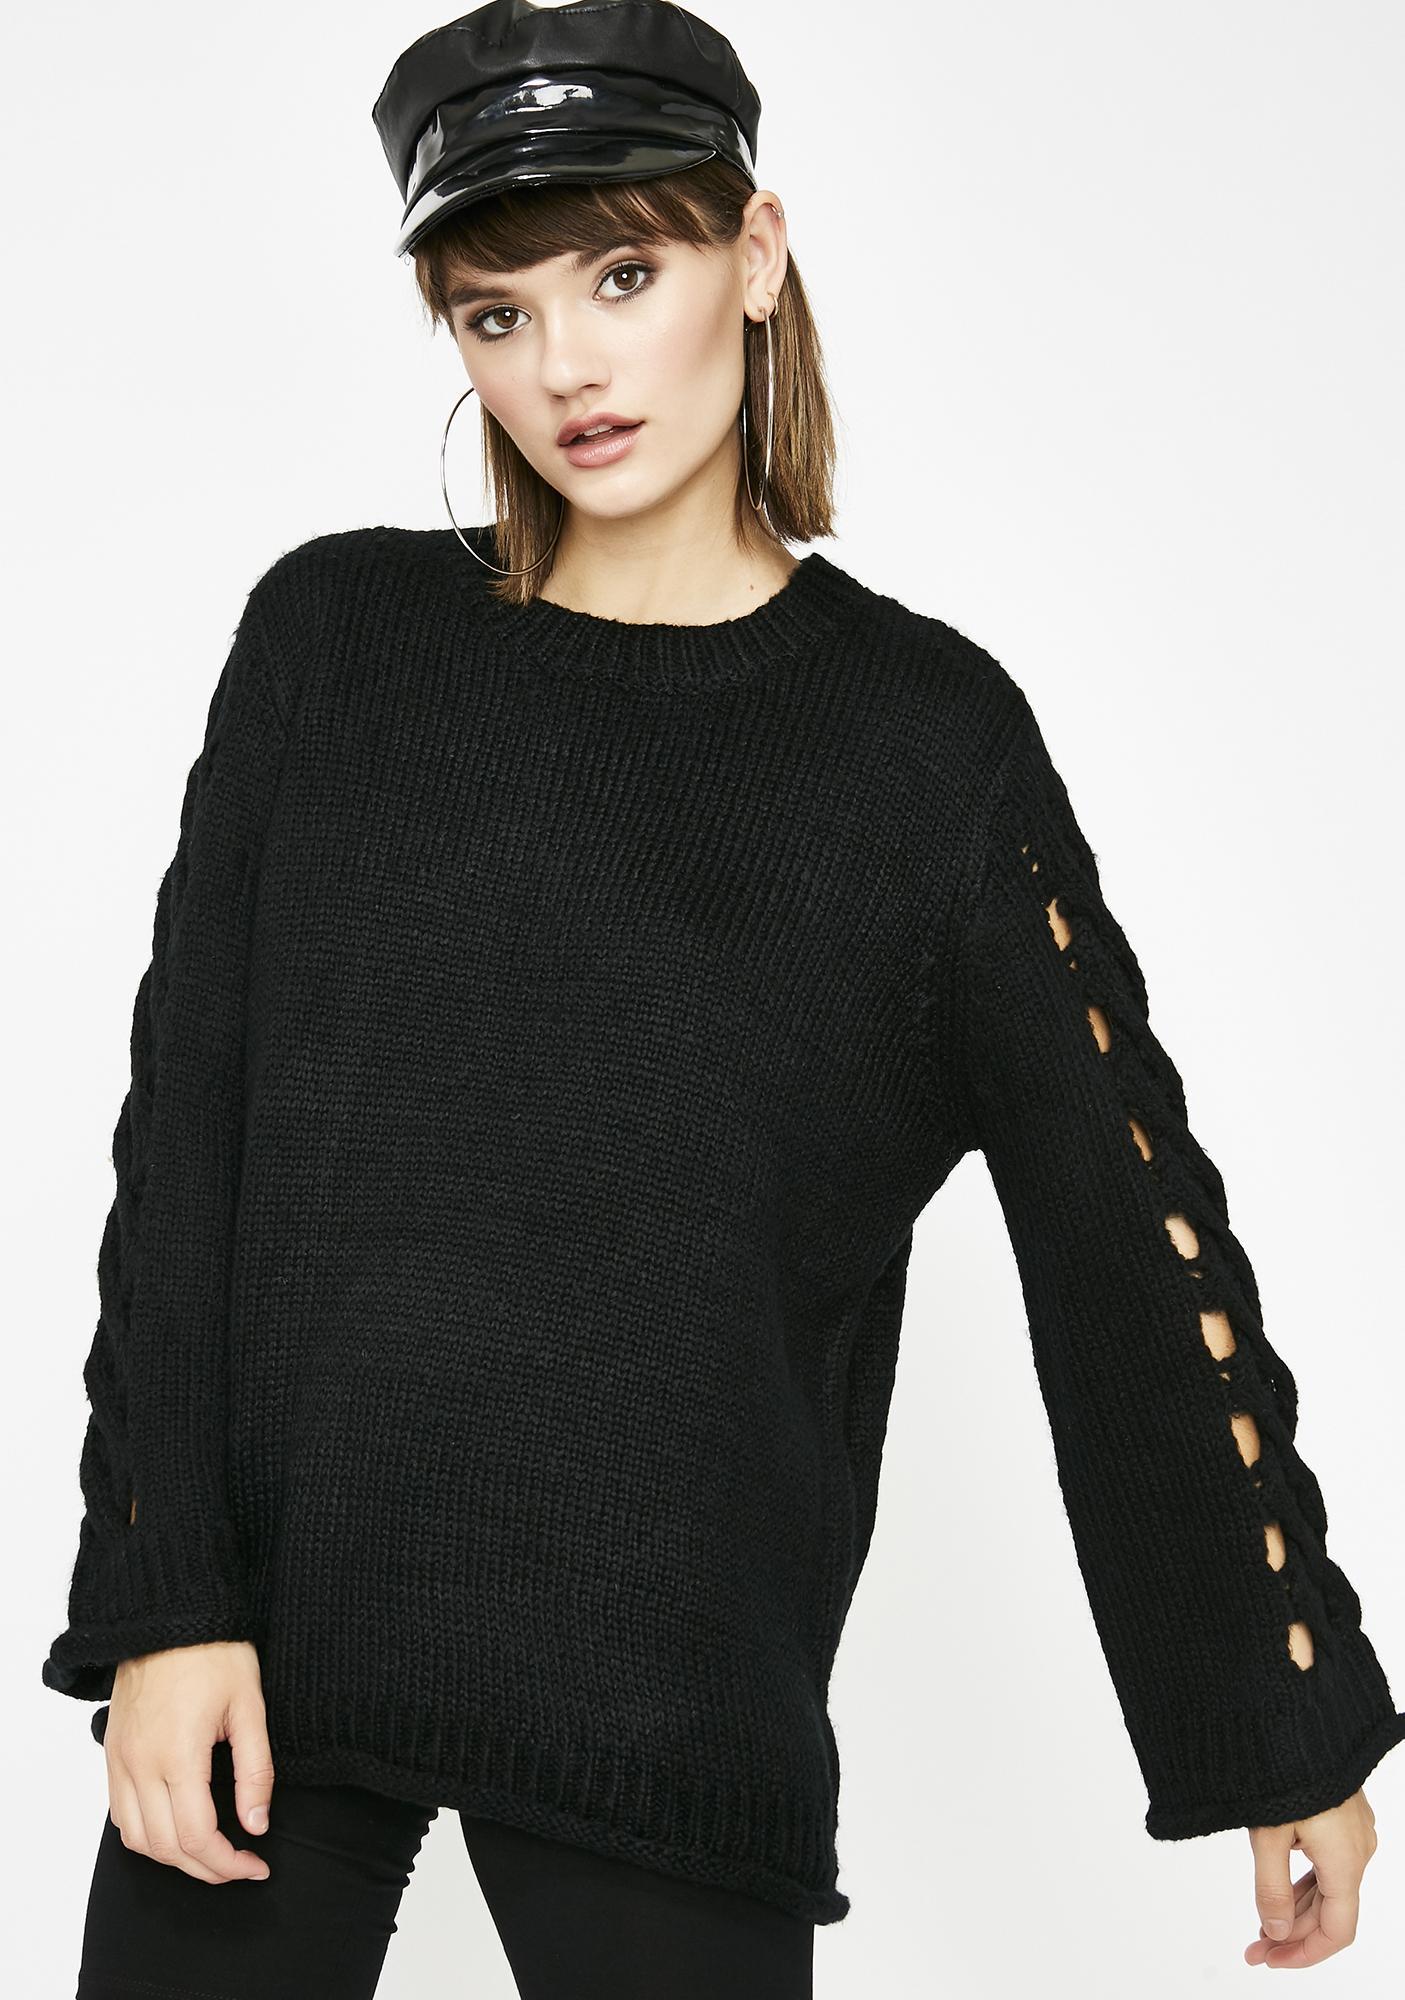 6716751da21 Midnight Twisted Dreams Oversize Sweater